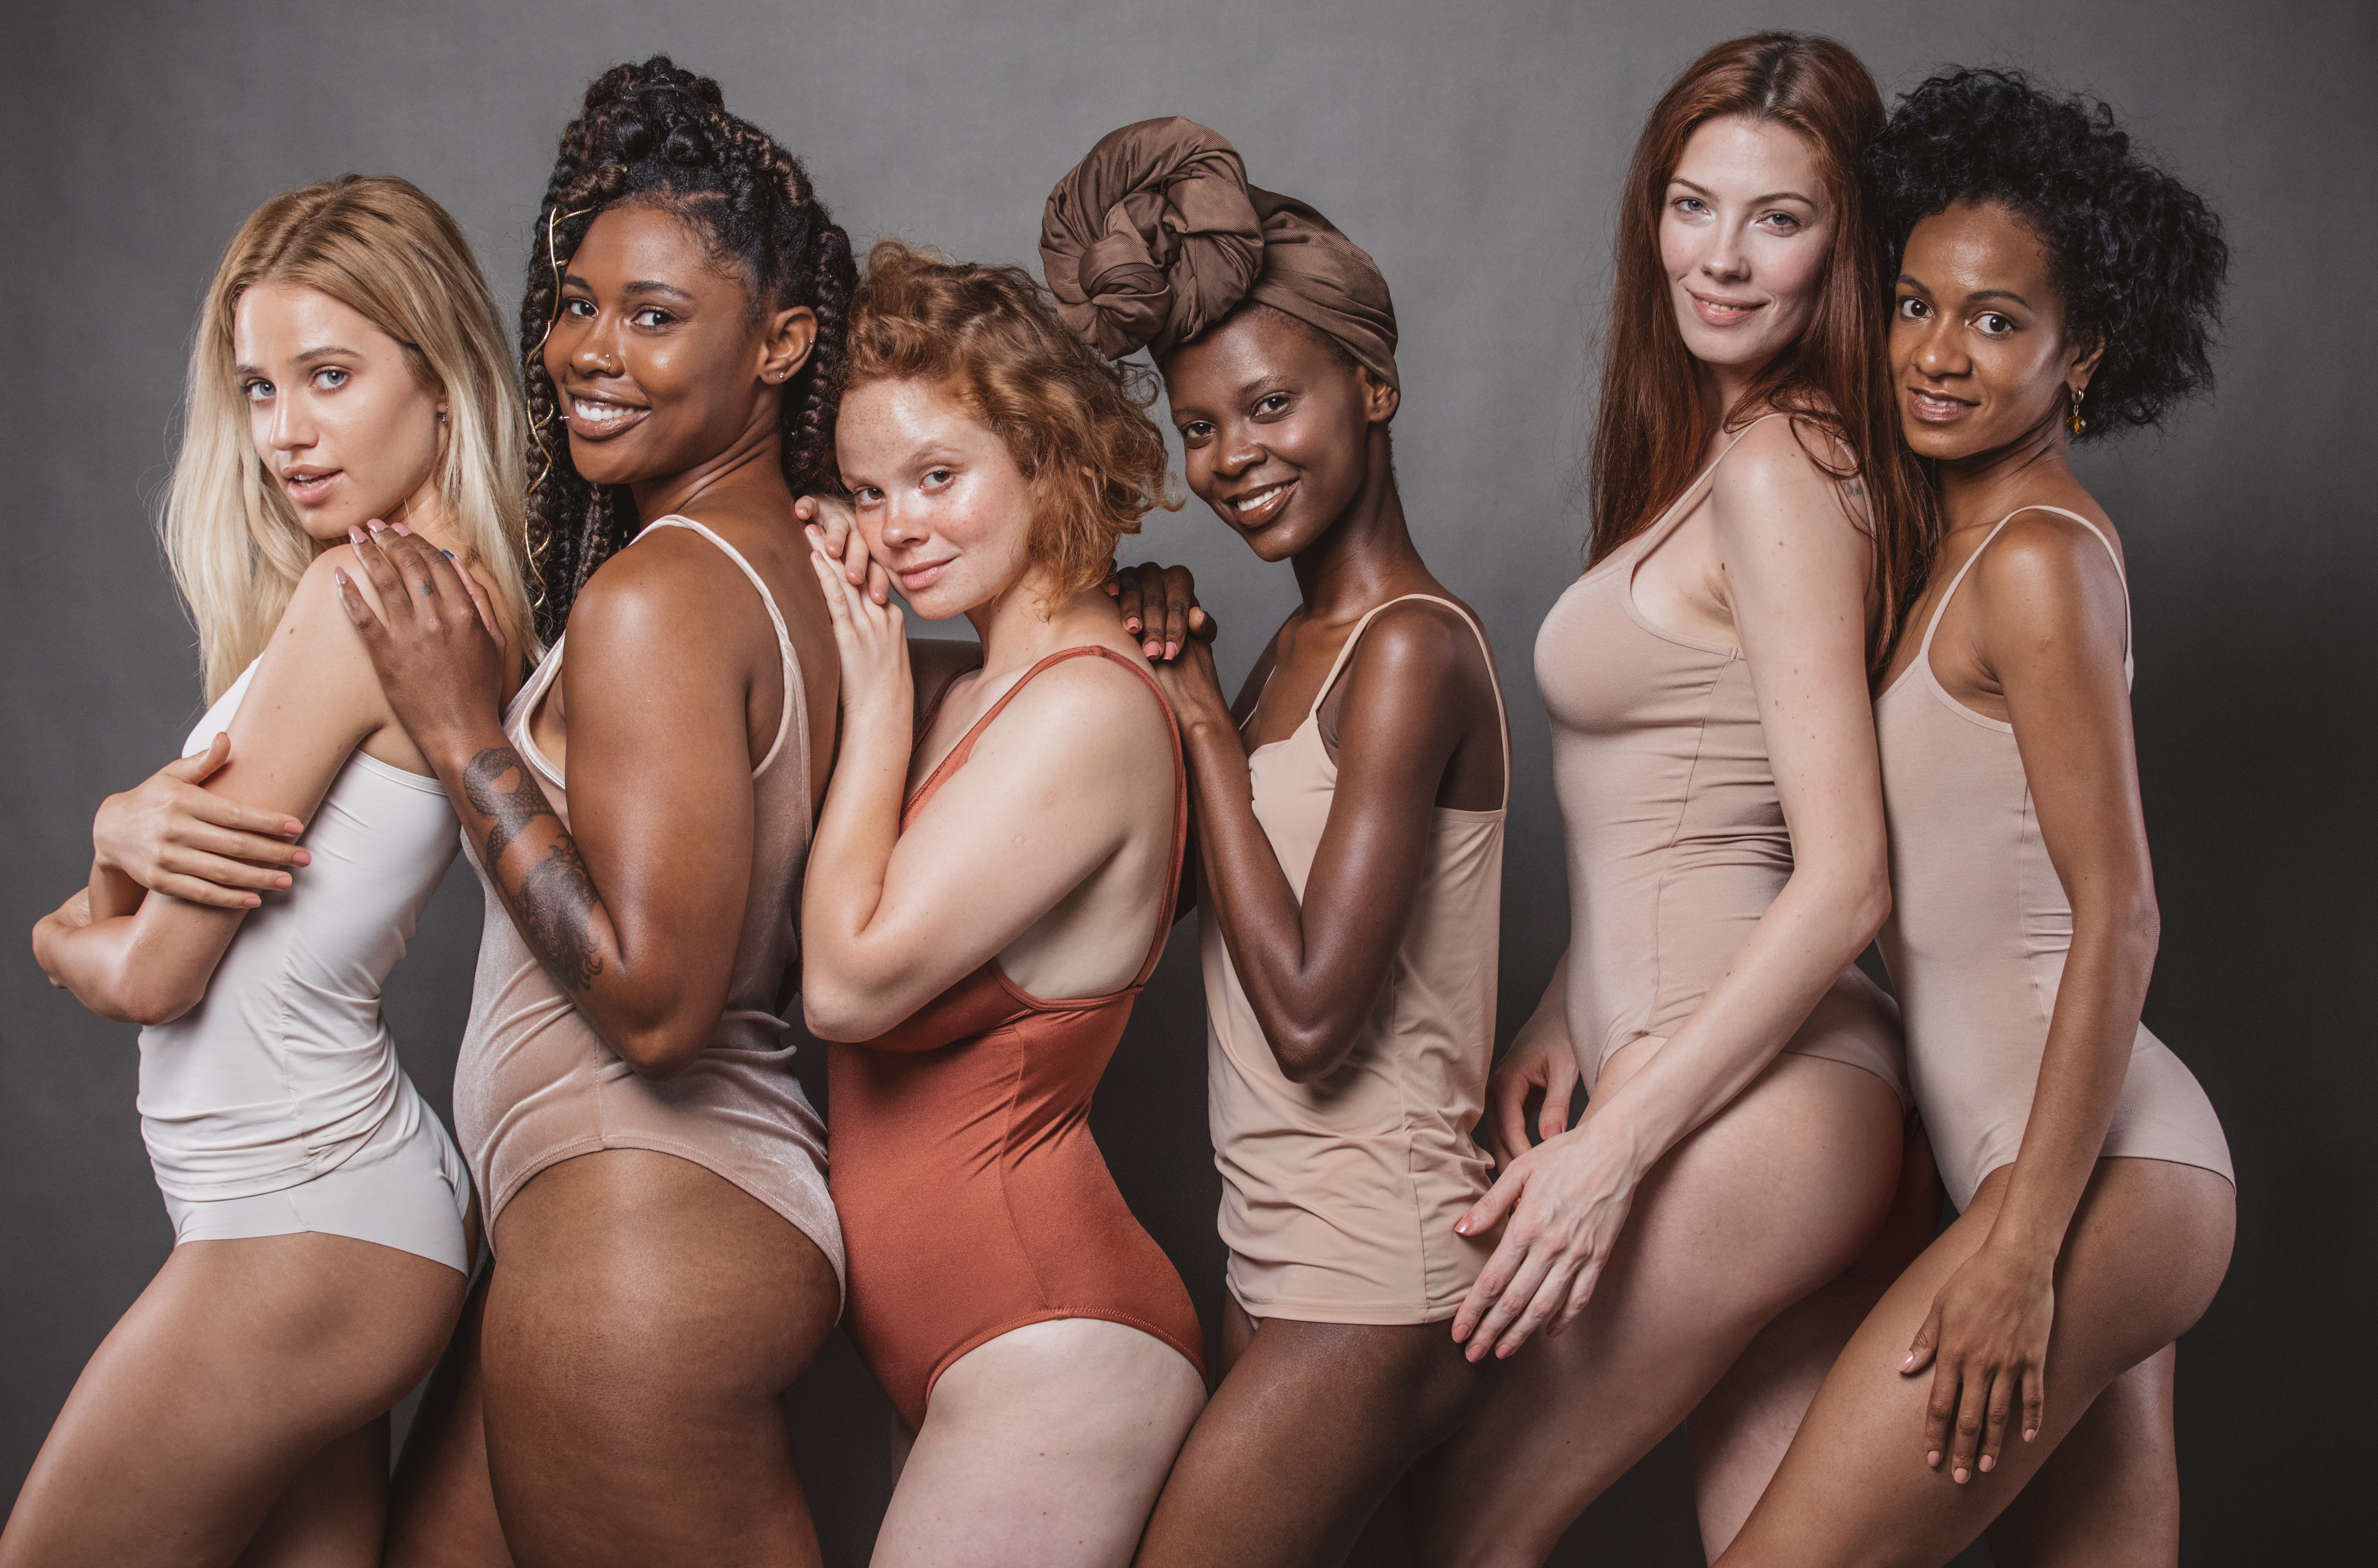 Body diversity